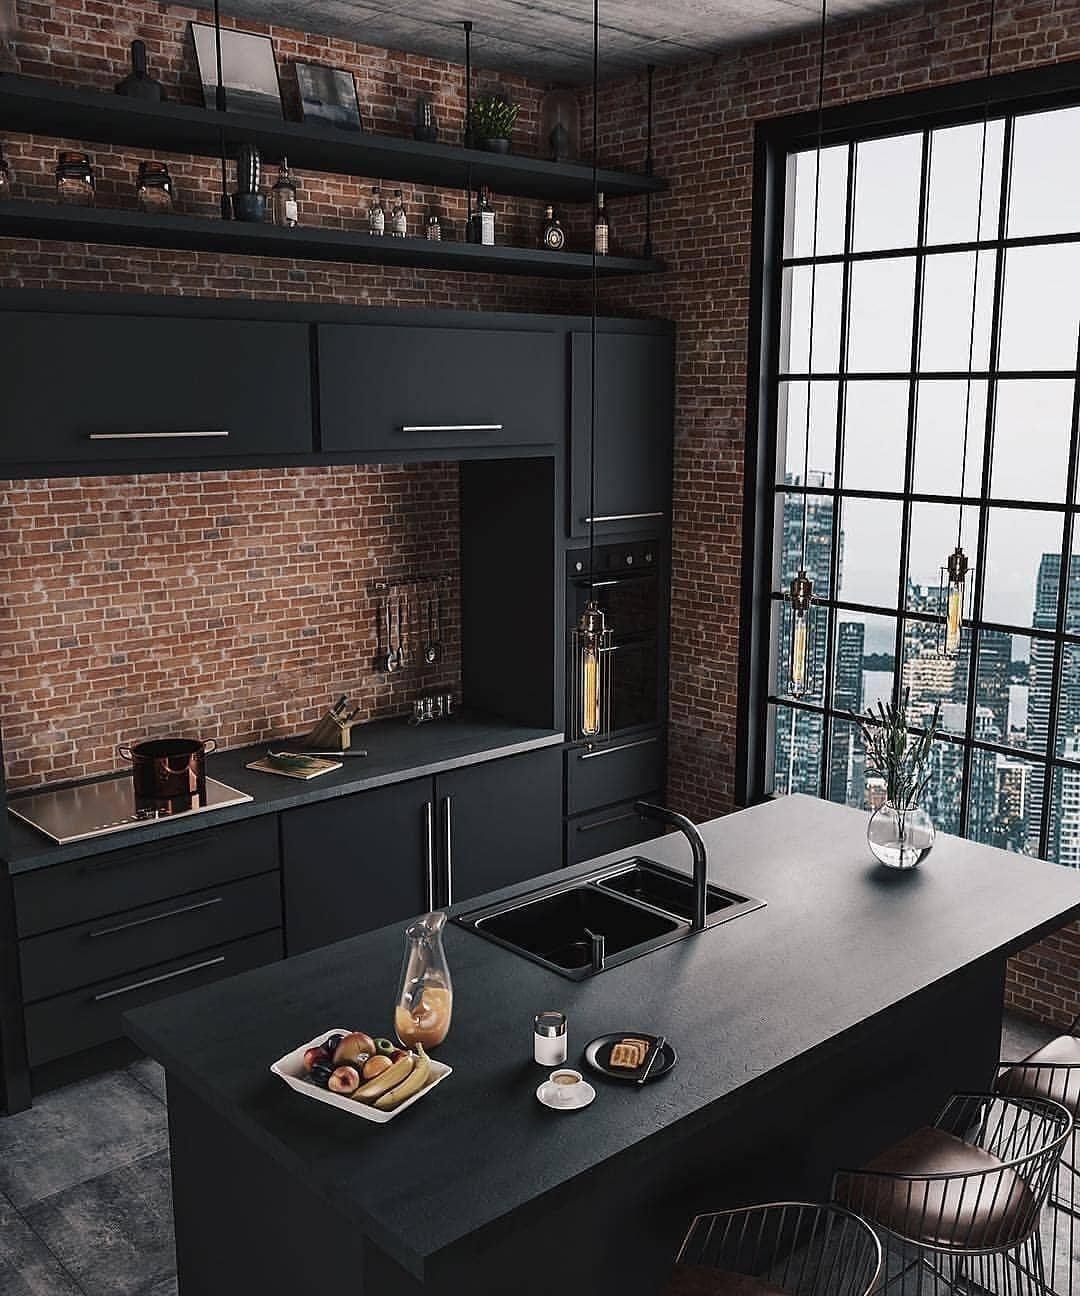 New The 10 Best Home Decor With Pictures Czarna Matowa Kuchnia Z Wyspa Do Tego Cegla I Taaakie Ok Top Kitchen Trends Home Interior Design House Interior